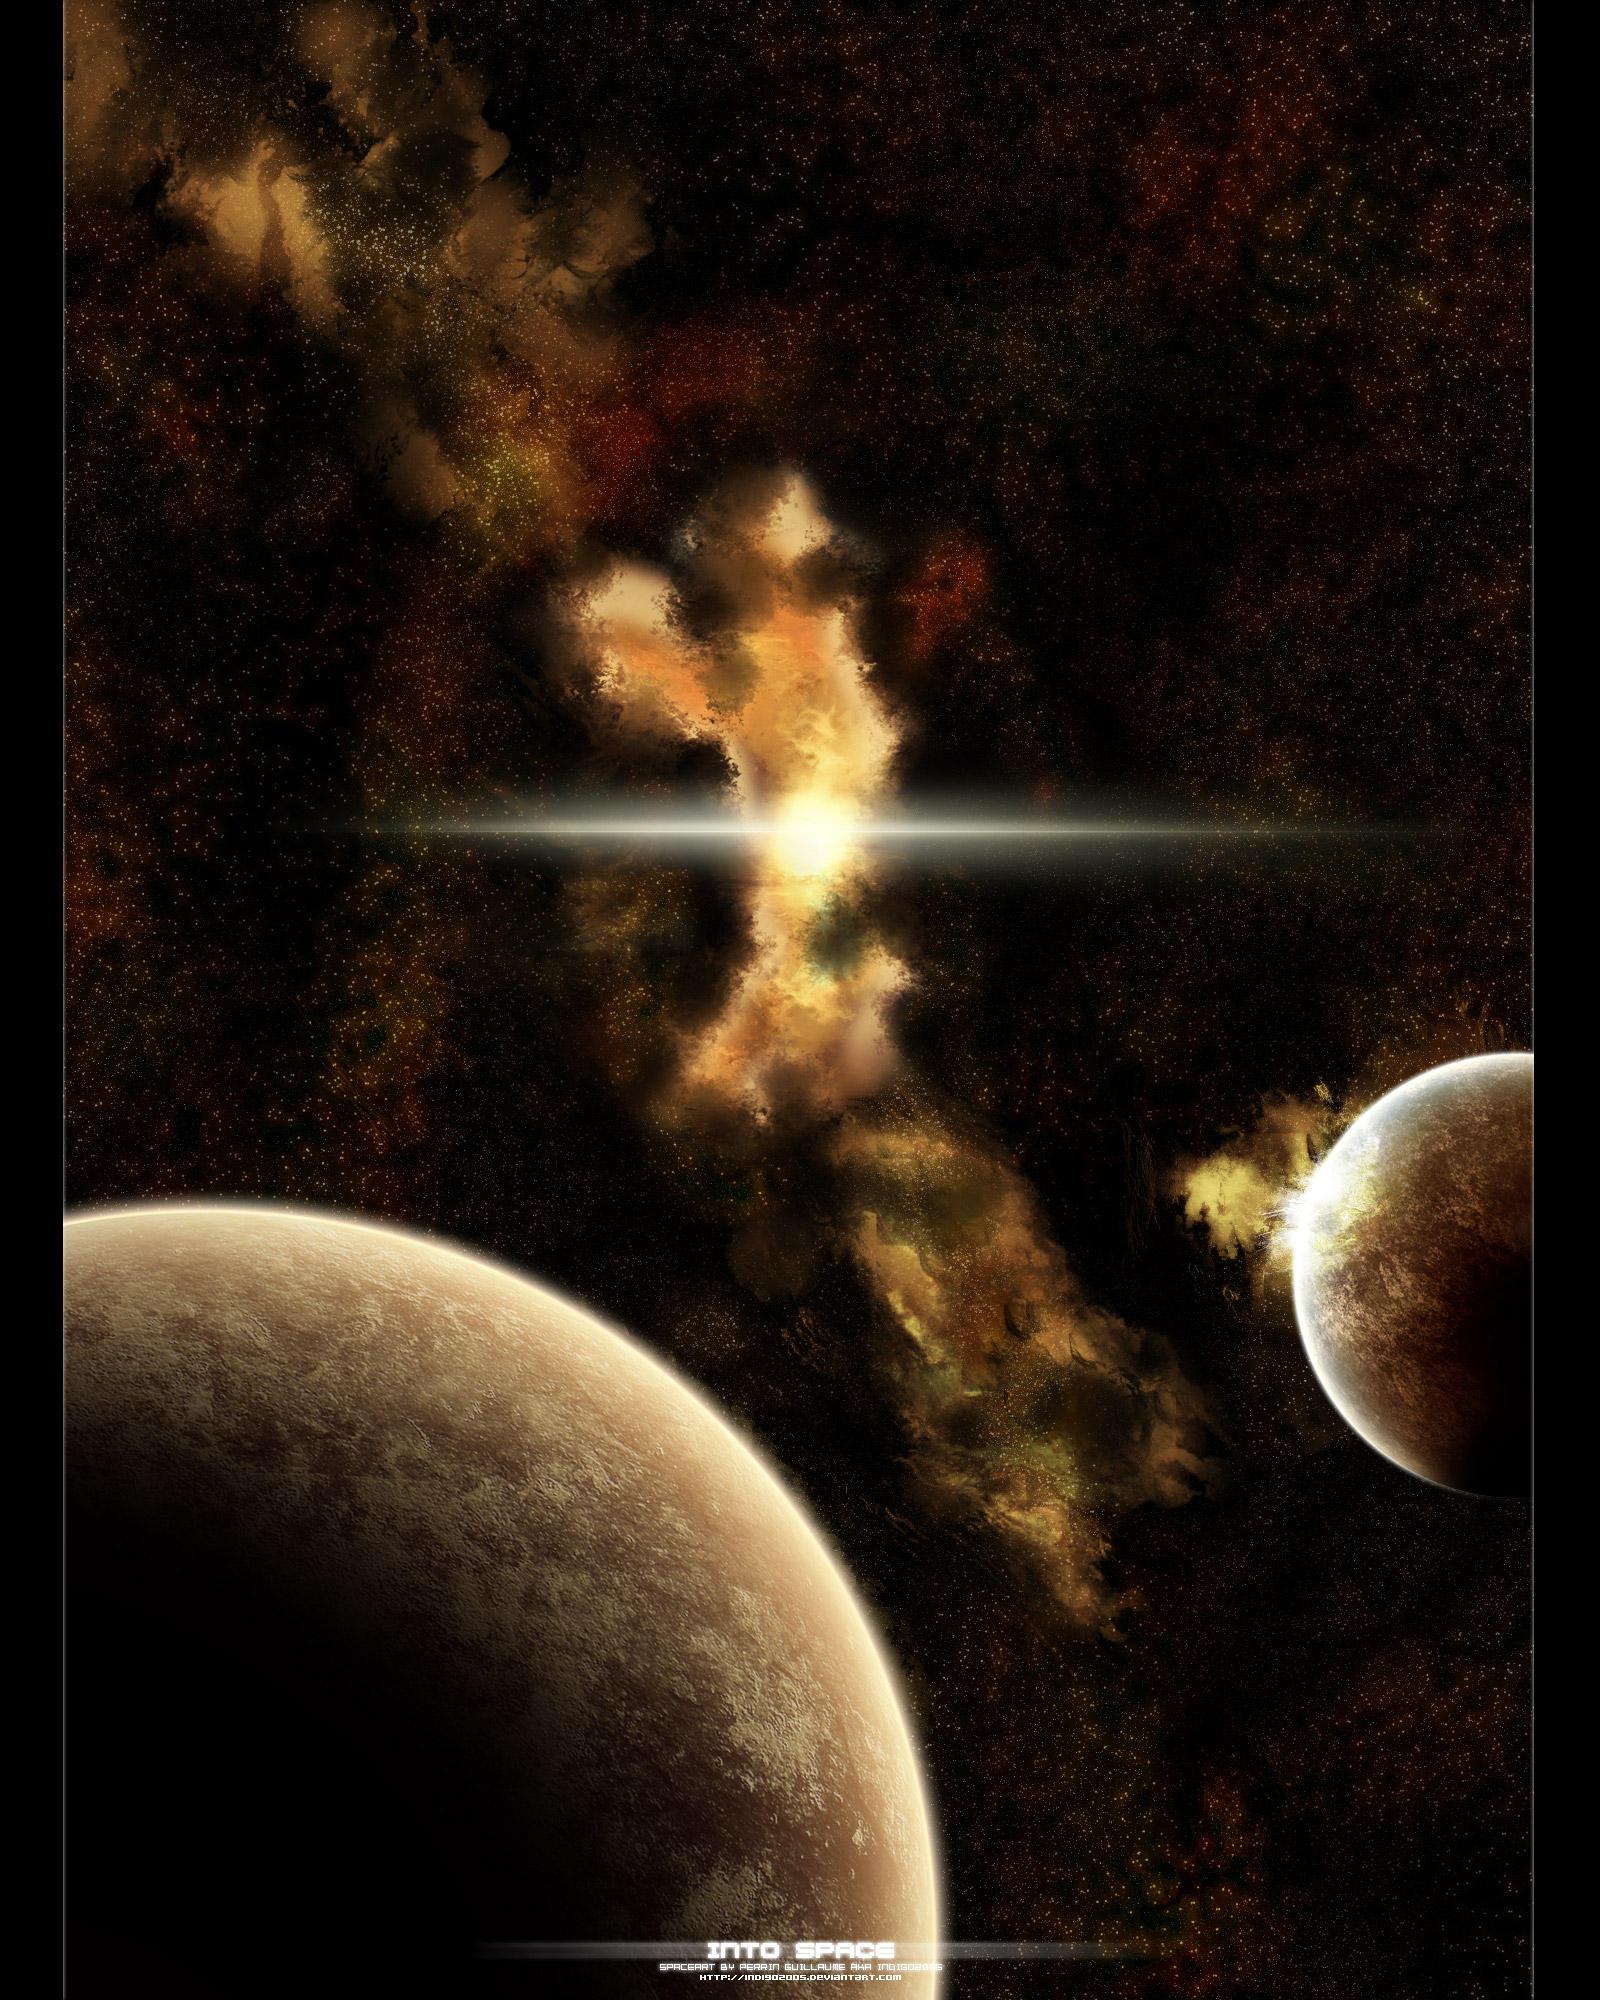 Into Space by Indigo2005